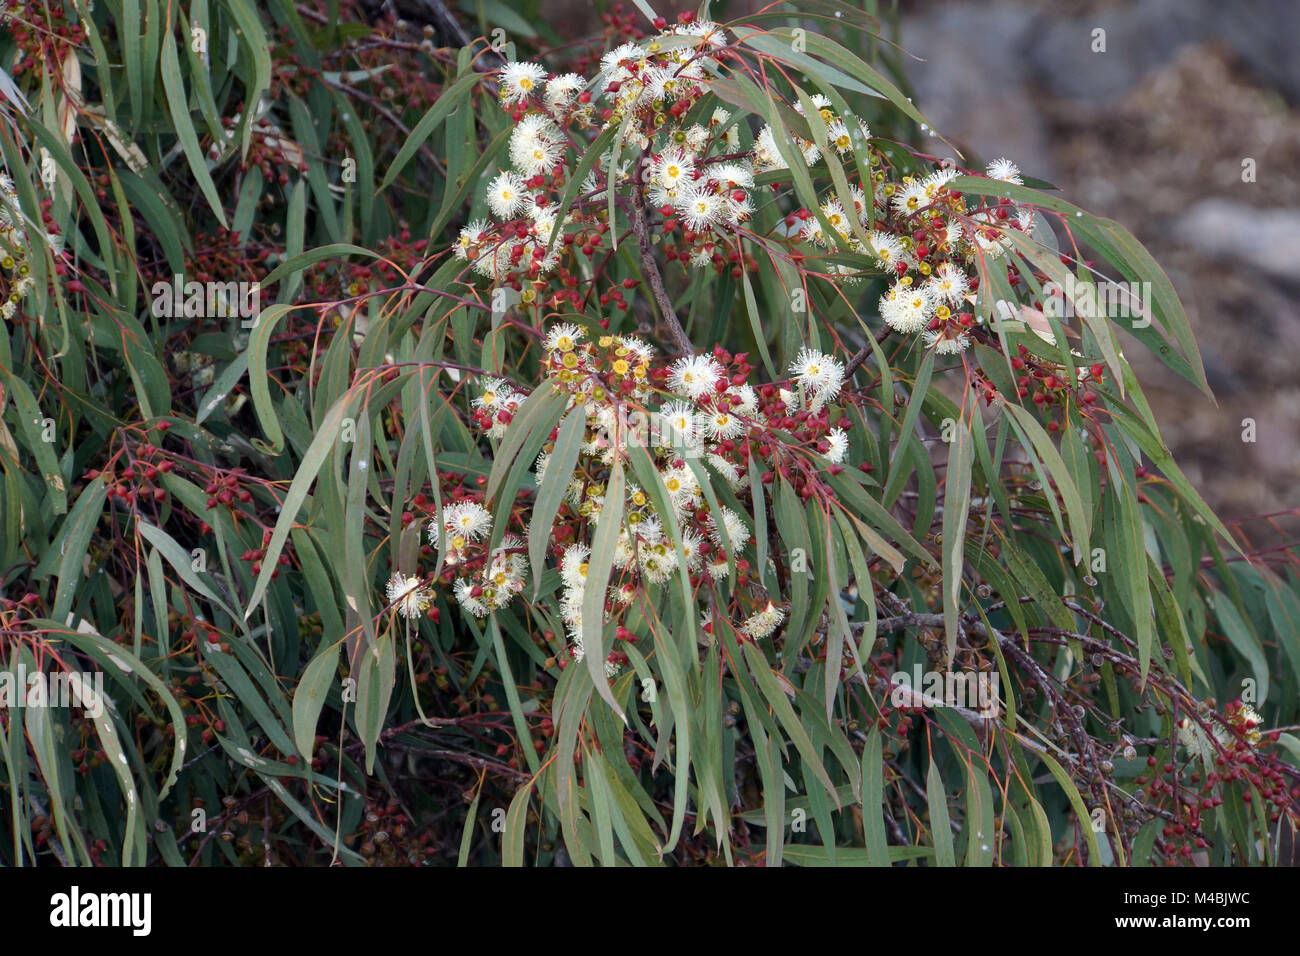 fever tree, blue gum tree - Eucalyptus globulus - Stock Image